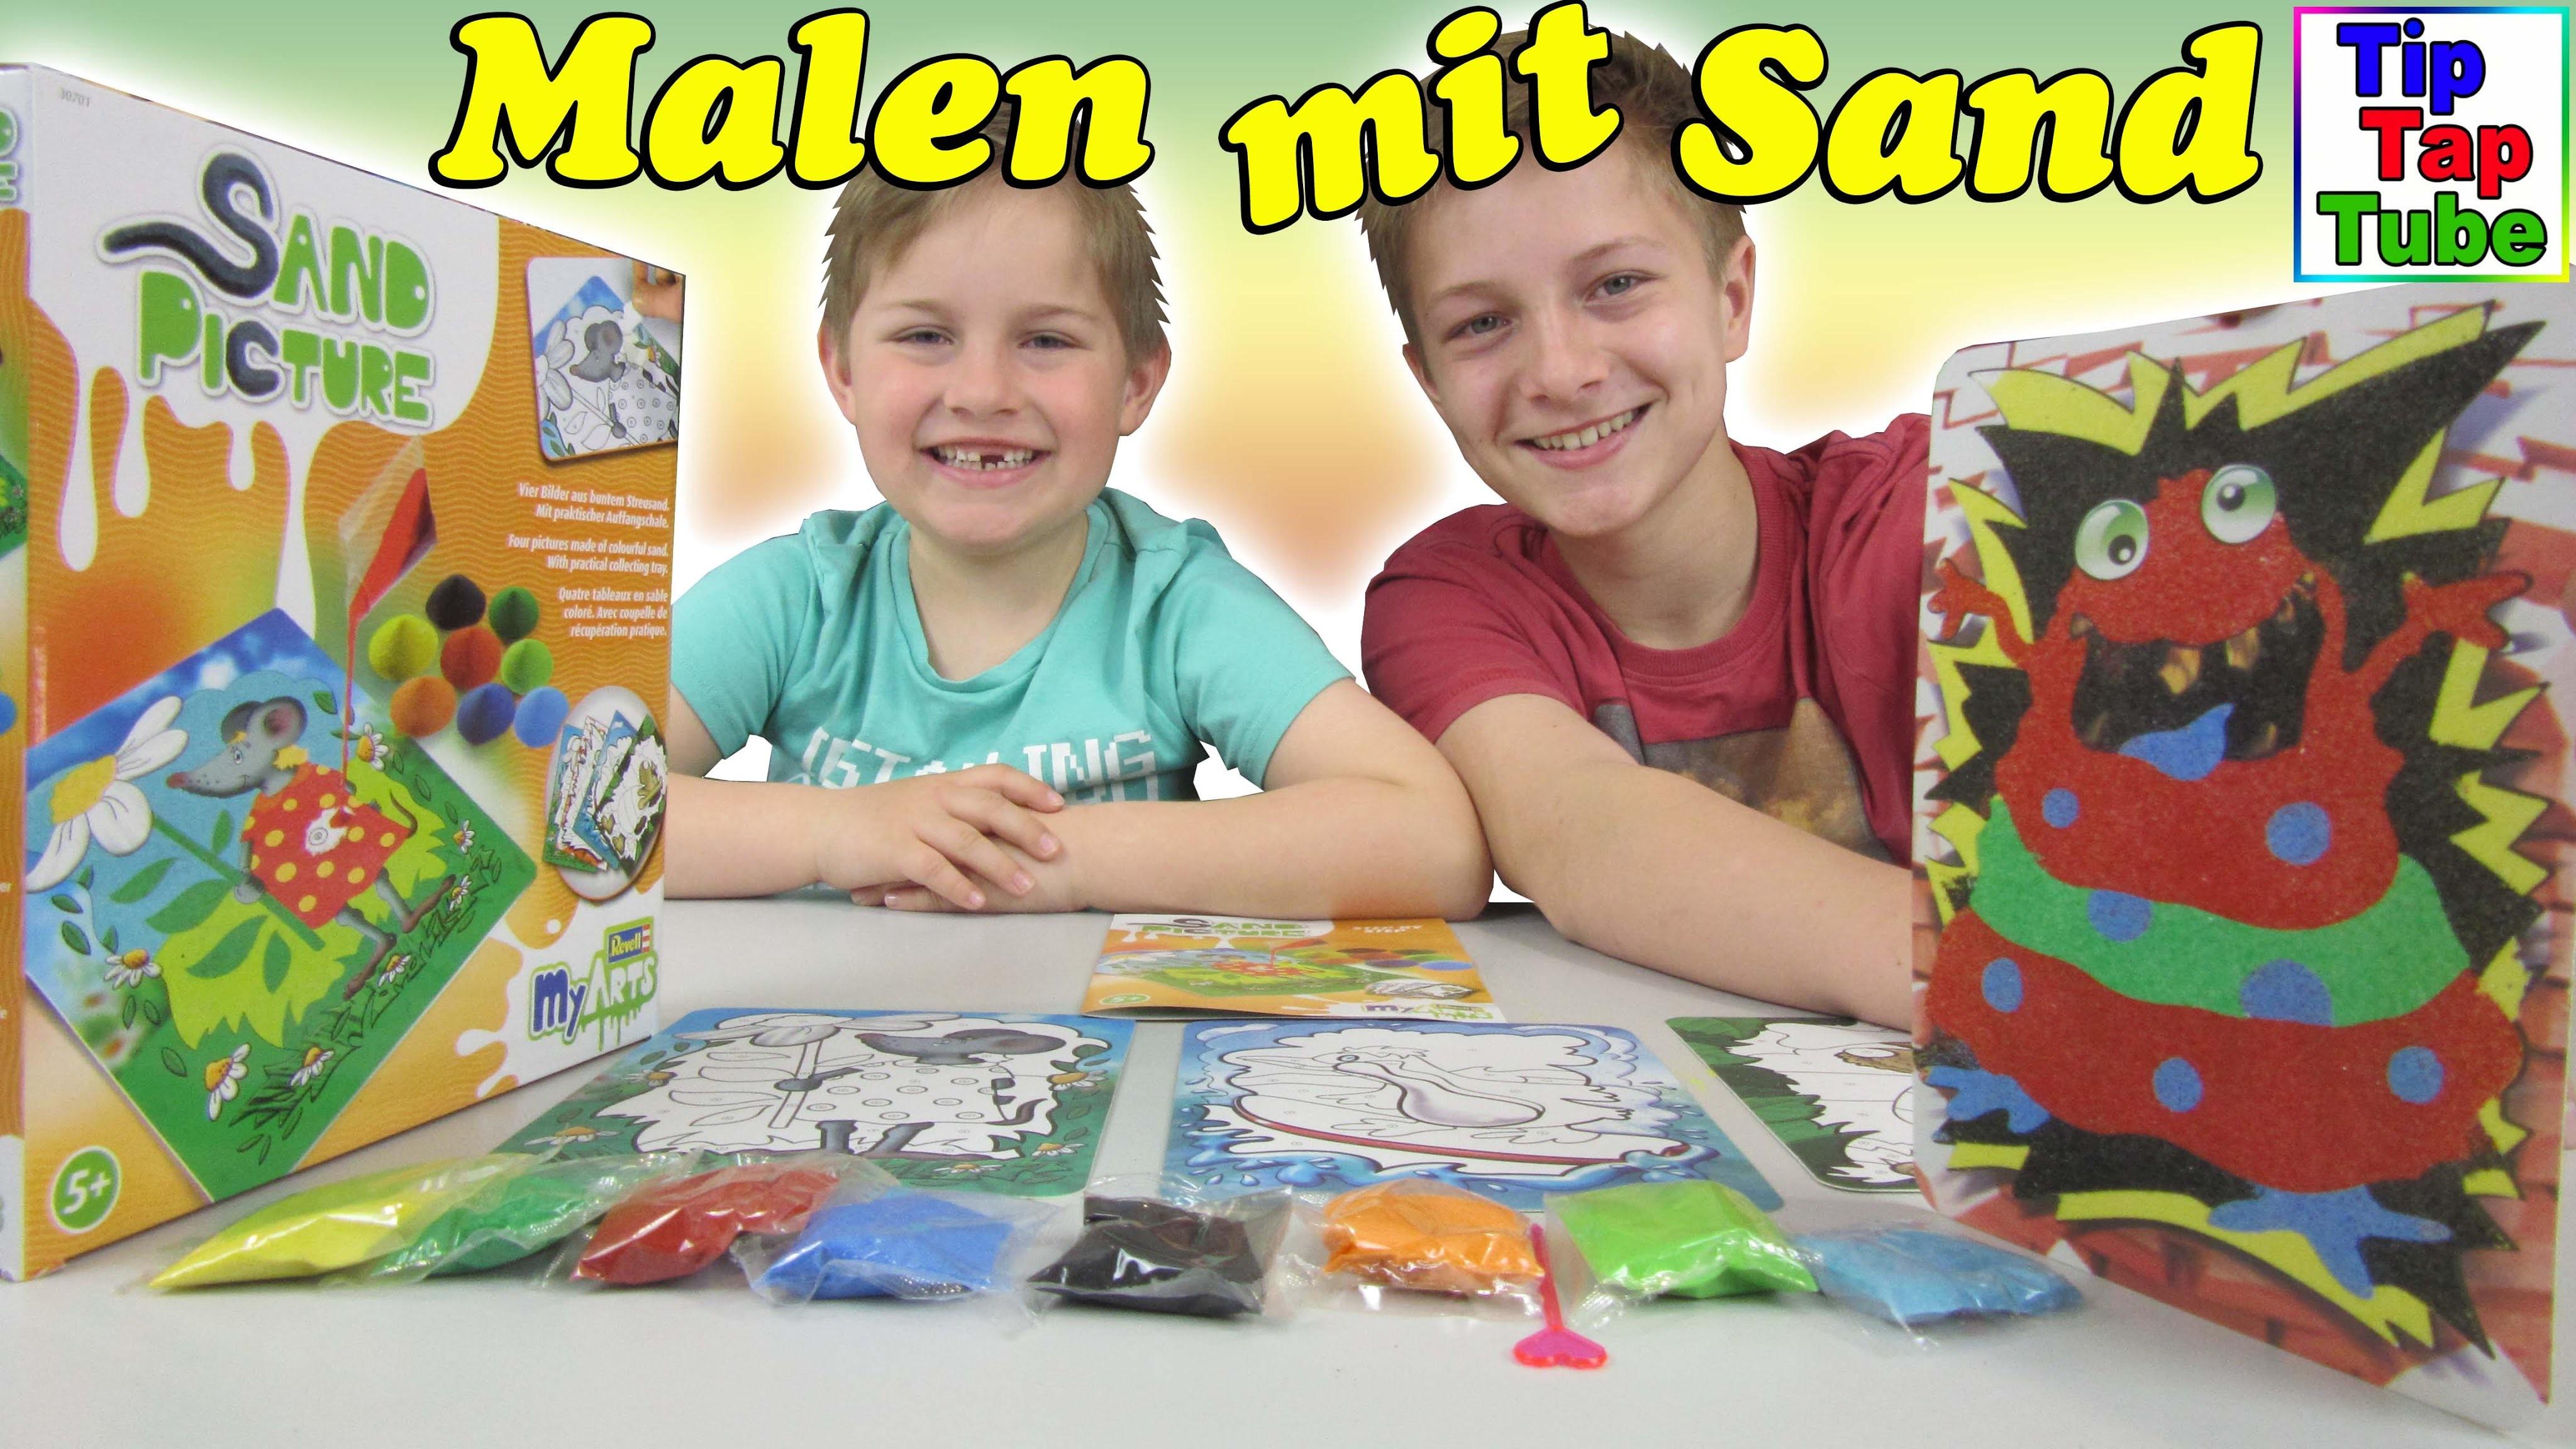 Sand Picture Farbsand Kinder Bastel Set DIY Revell my Arts Spielzeug Video TipTapTube Kinderkanal